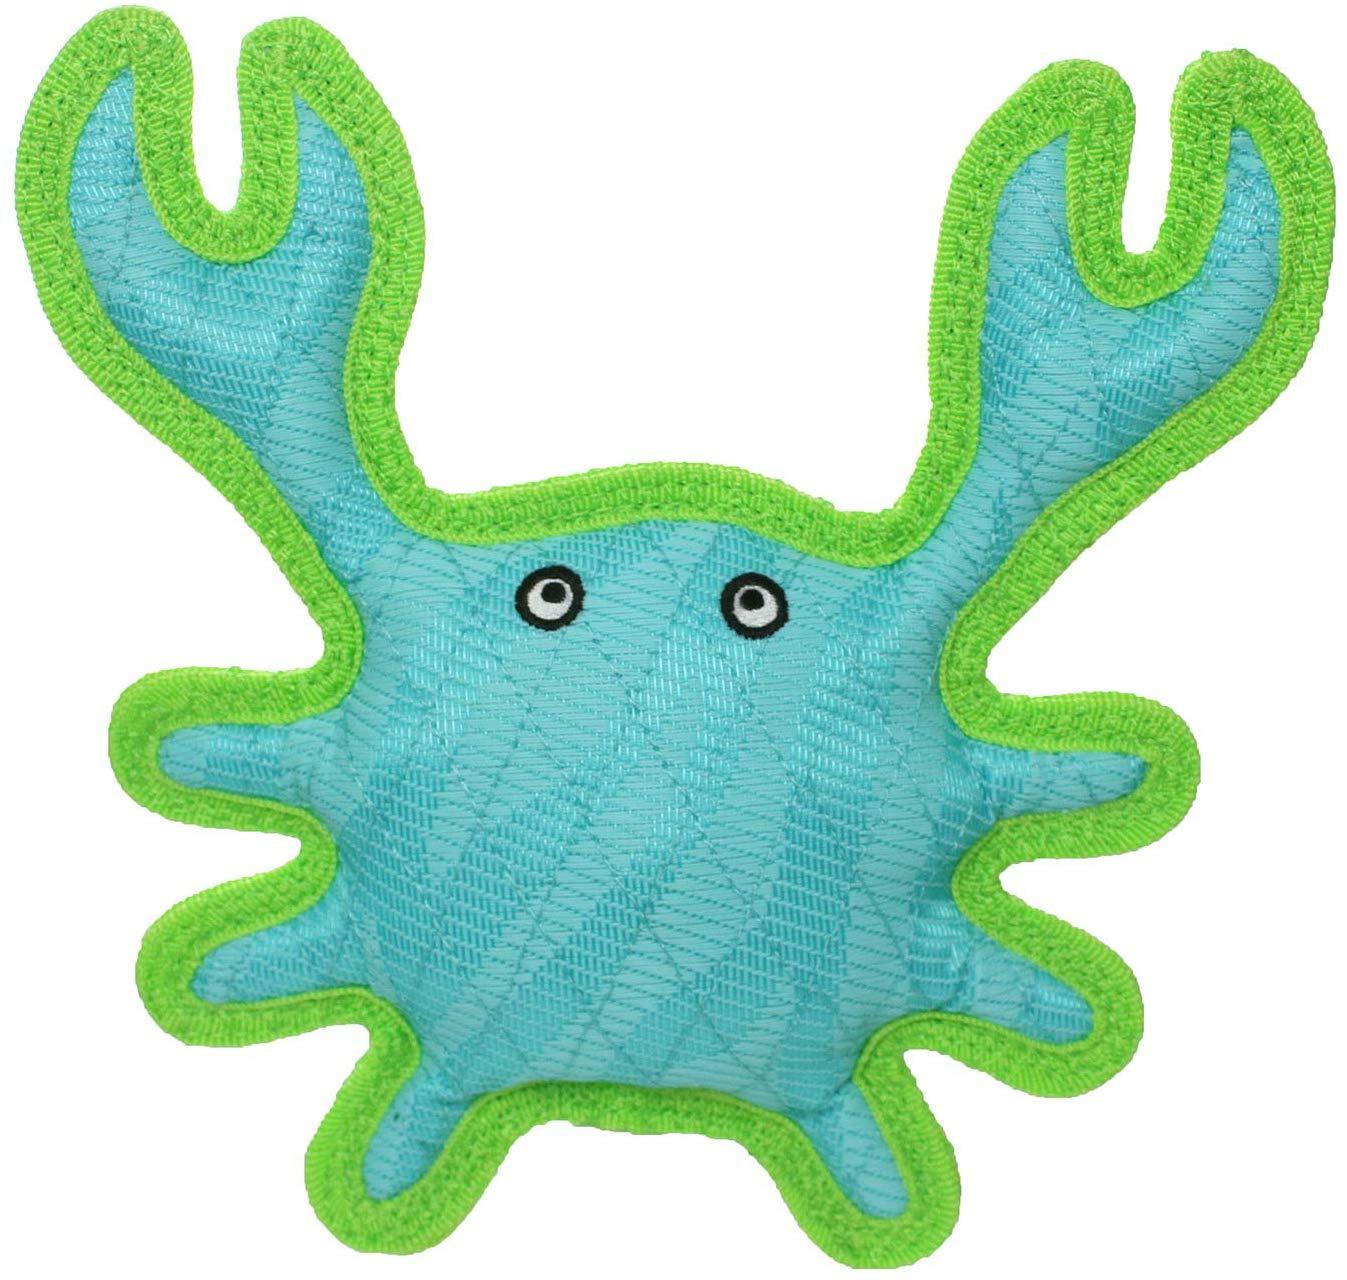 DuraForce Crab Tiger Dog Toy, Blue